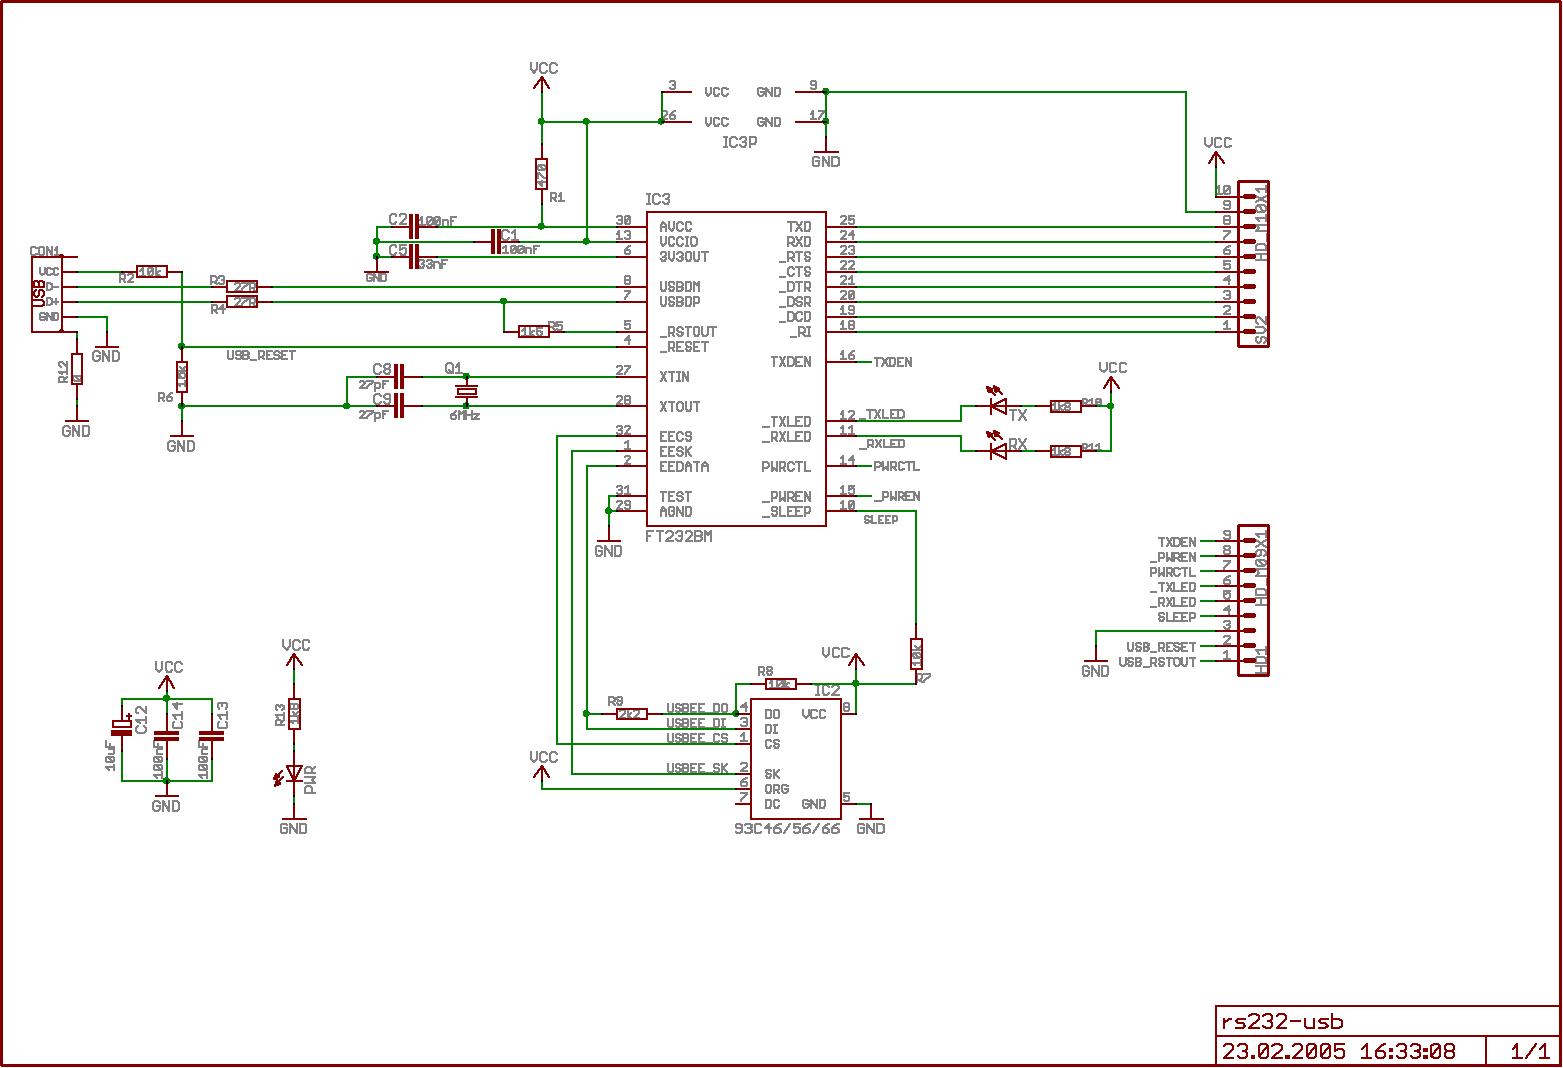 Search moreover X10 Wiring Diagram Wiring Diagrams also Rj45 Cat6 Wiring Diagram together with B0000513O4 moreover Kit Solar Autocaravana 700w 12v 2 Baterias Gell precio. on tripp lite wiring diagram